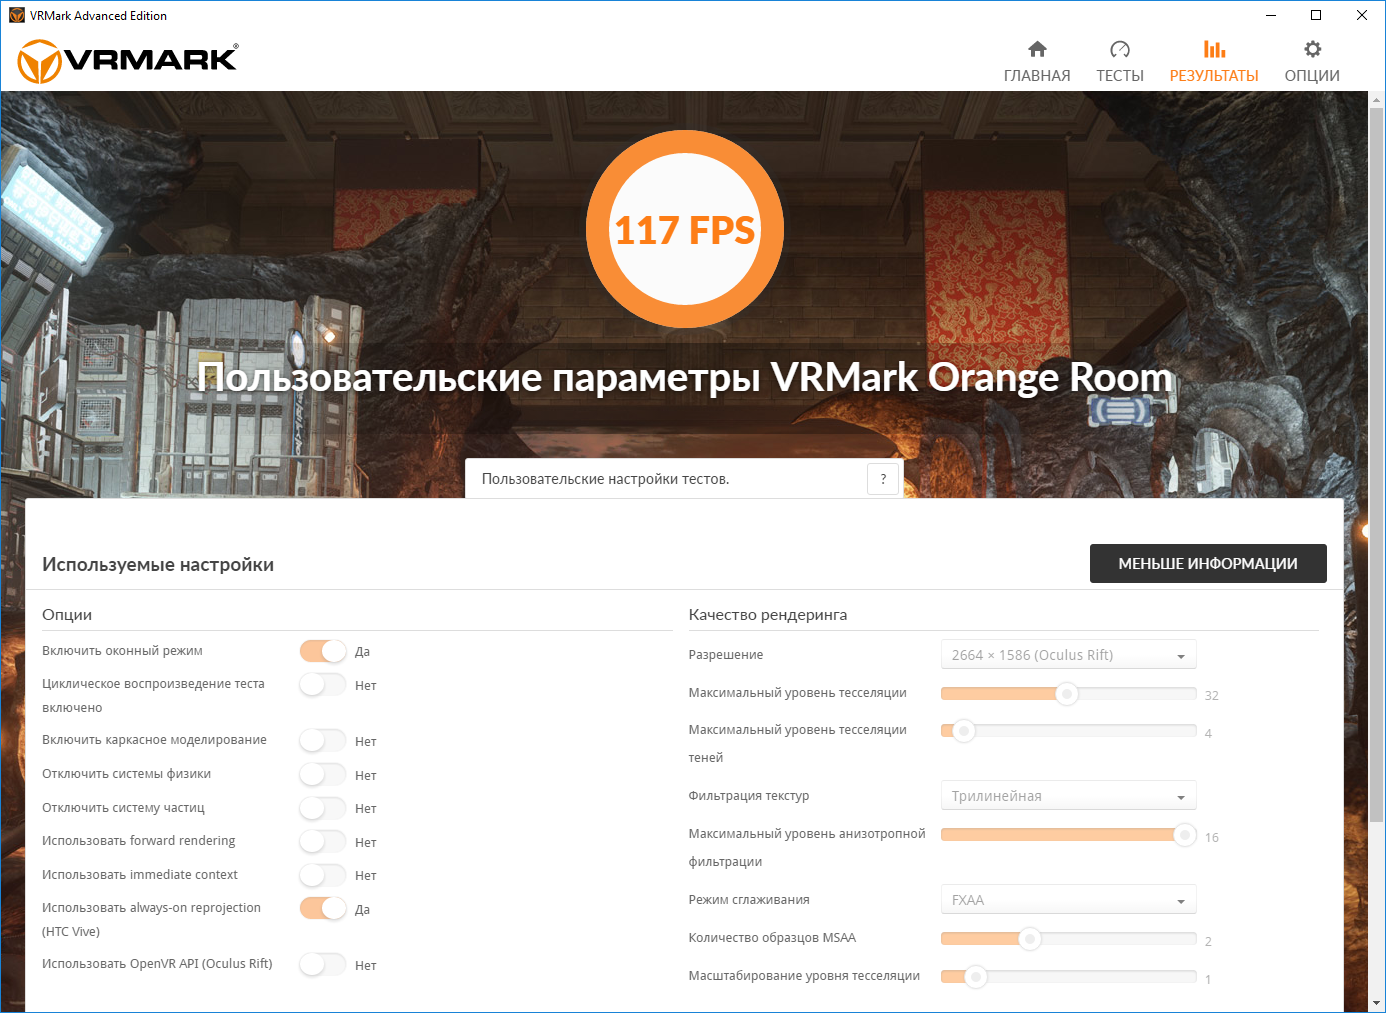 VRMark Orange Room